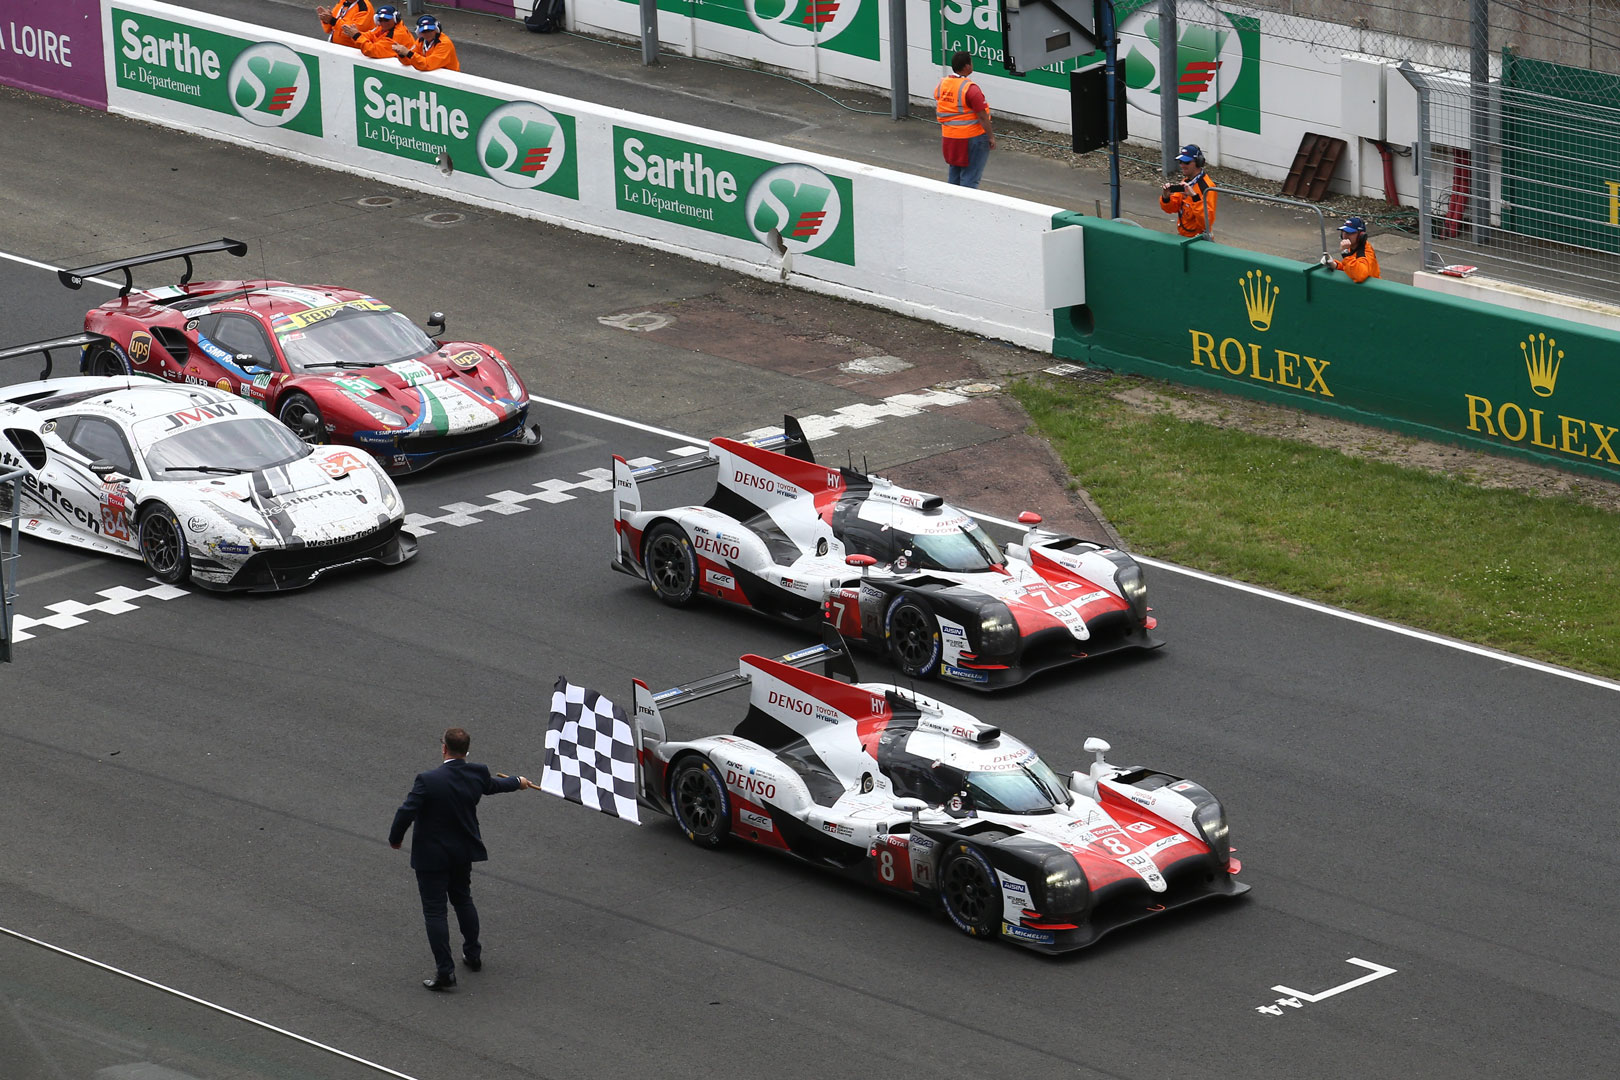 GR Super Sport Concept finish 1, 2 at Le Mans